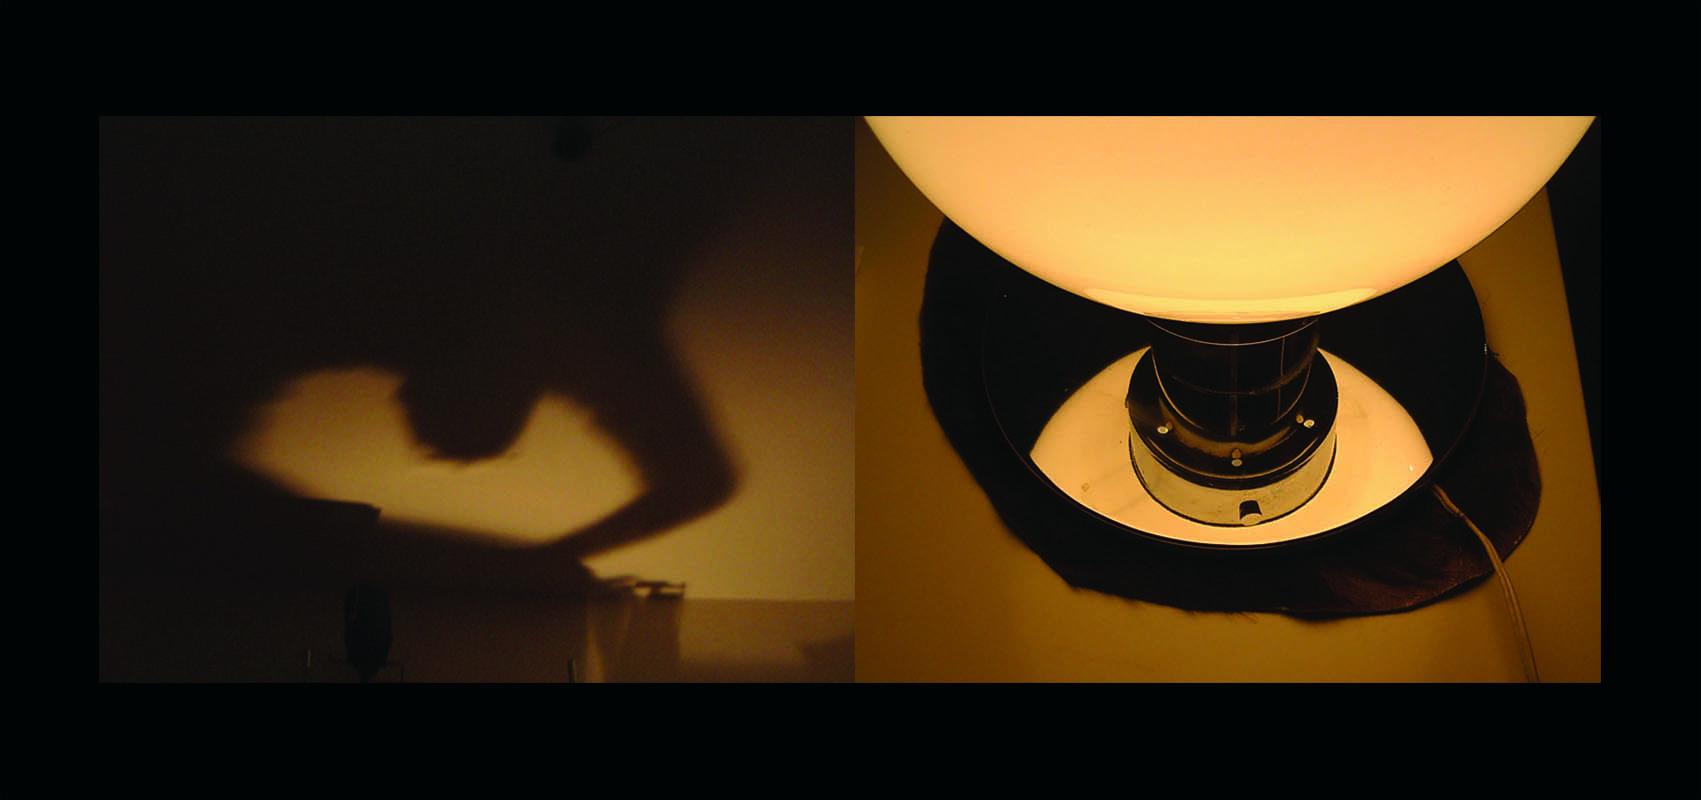 Luis Pita | Intervenciones Fotográficas (Retoques y manipulaciones) | Photographic Interventions (Retouching and manipulations) | Centro de Arte | Madrid | La vanguardia del retoque fotográfico artístico | Avant Garde Photo Retouching | Double imaoge | Parallel worlds | SERIES FOTOGRAFICAS_ (2006)  Dos Visiones. Una Mirada| Masters of Photoshop retouching | Maestros del retoque fotográfico en Photoshop